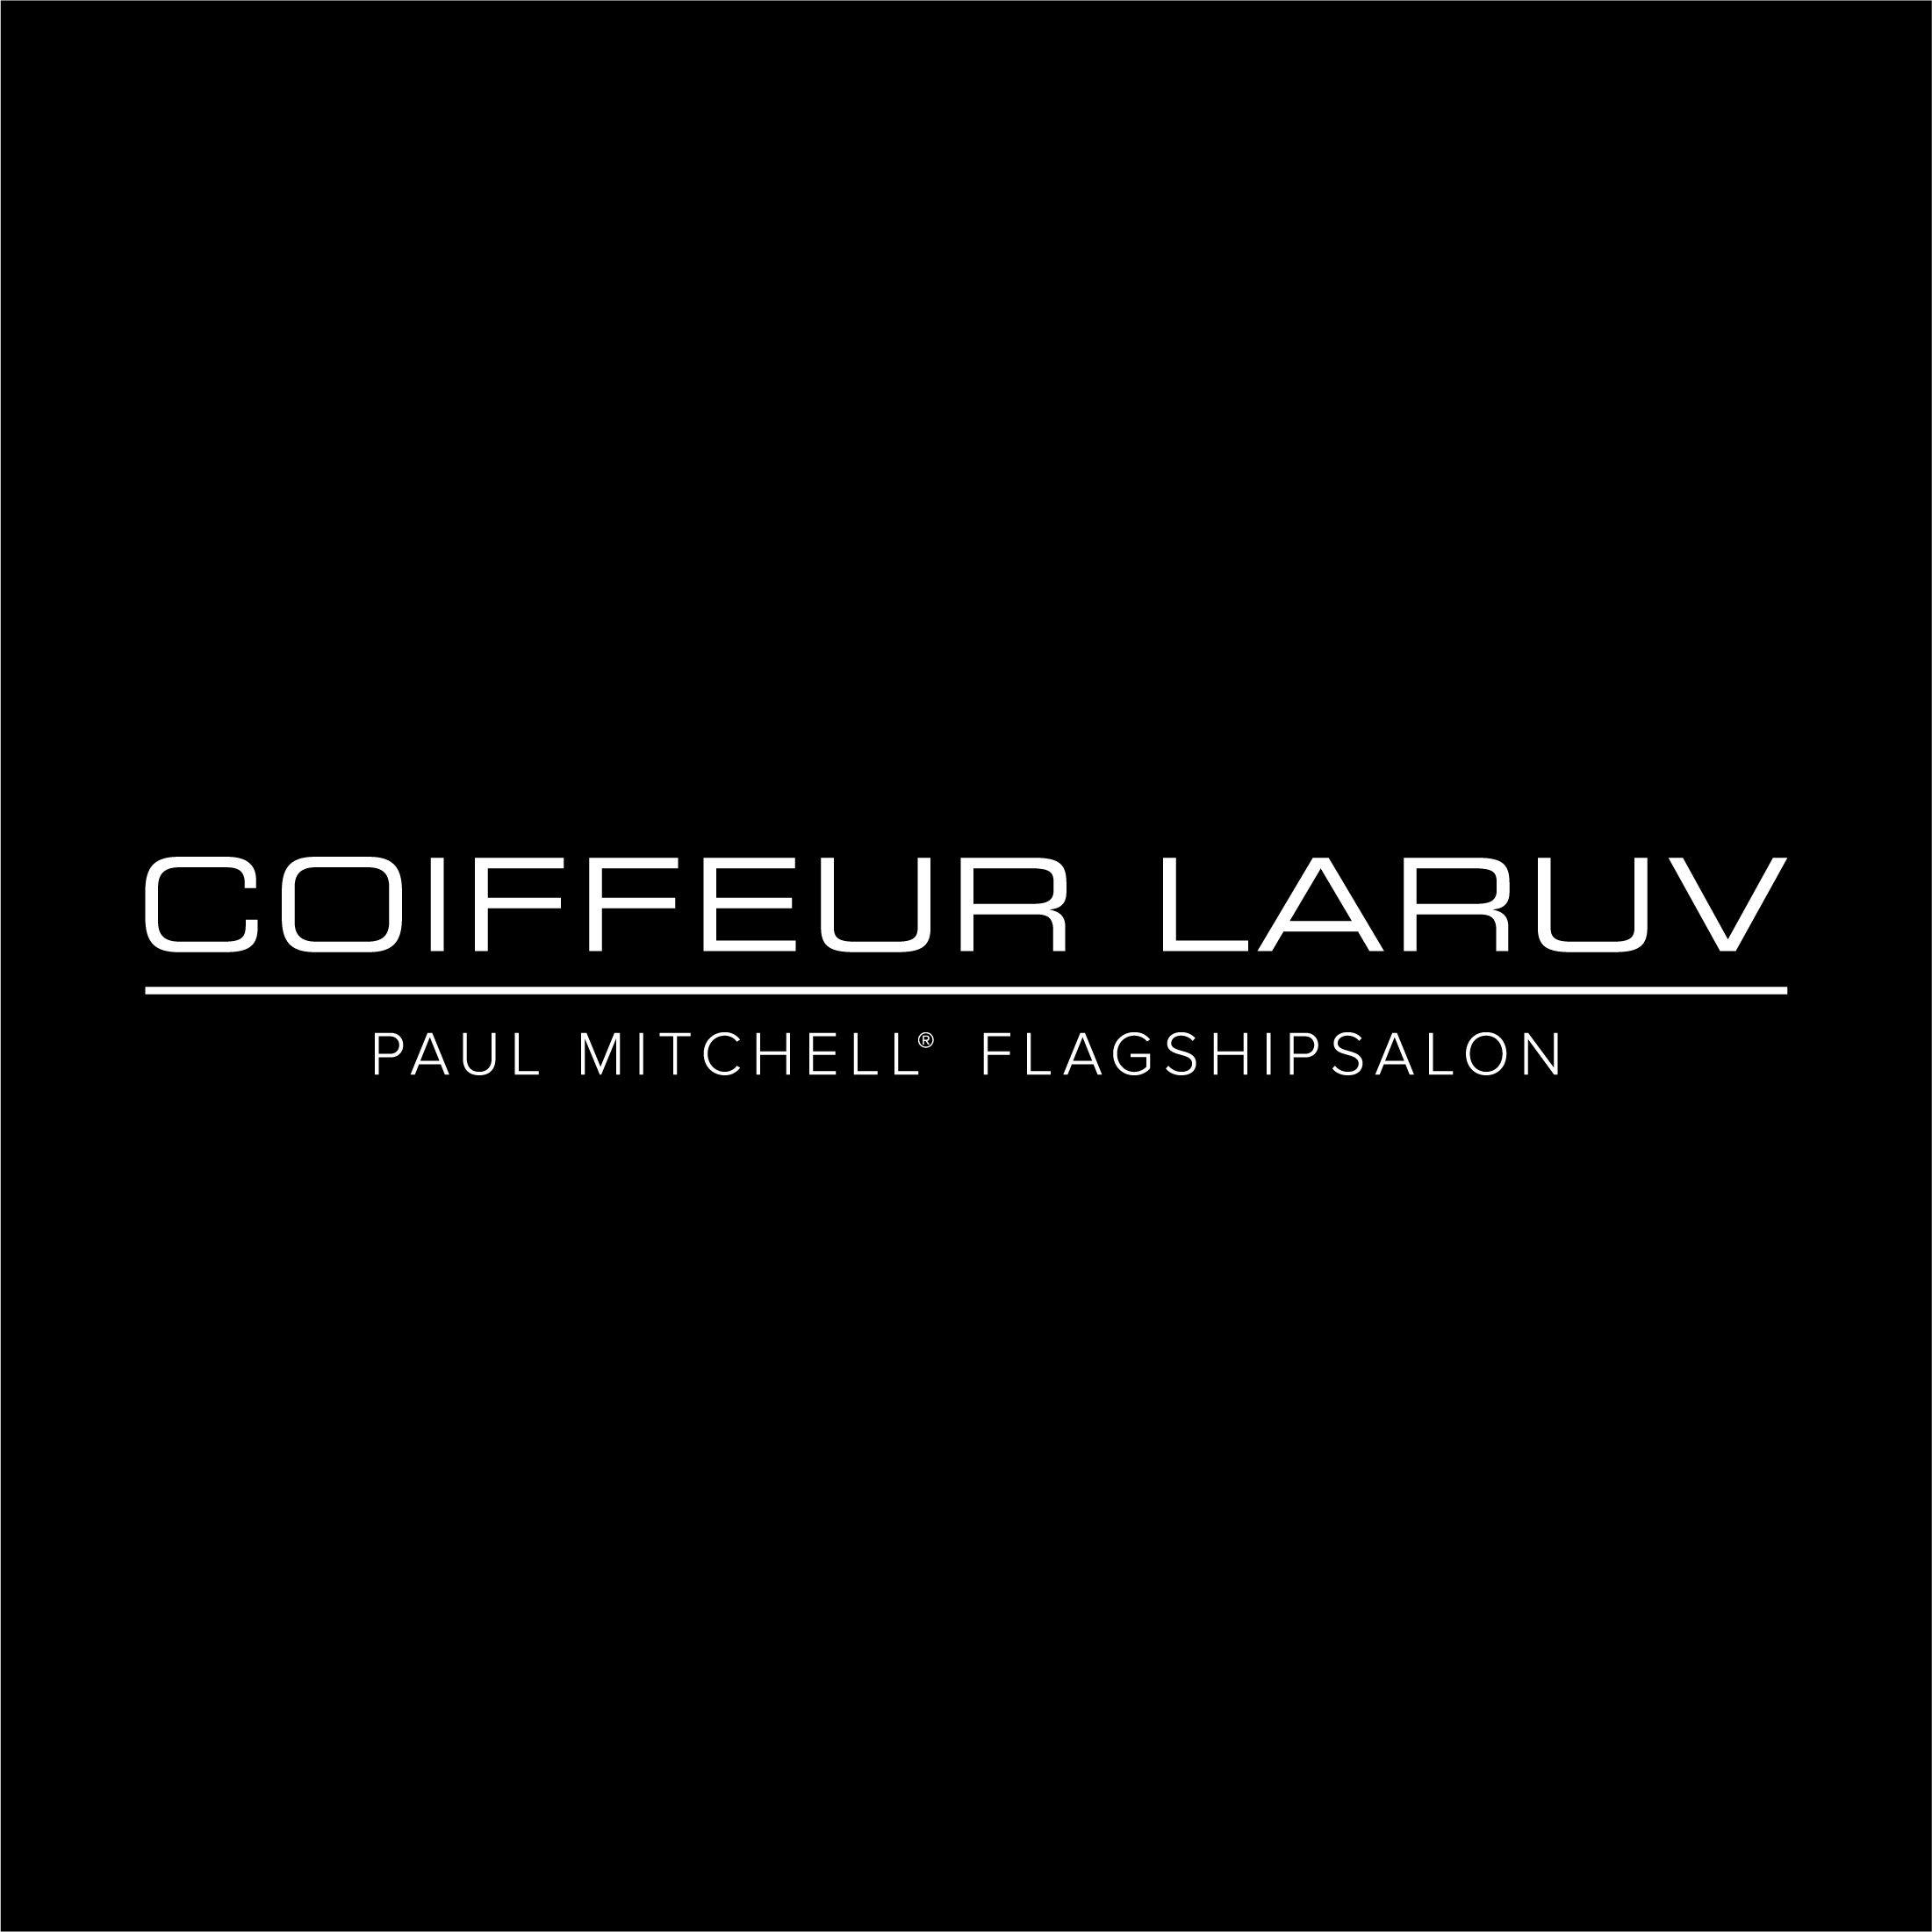 logo-309467-coiffeur-laruv-white-kasten